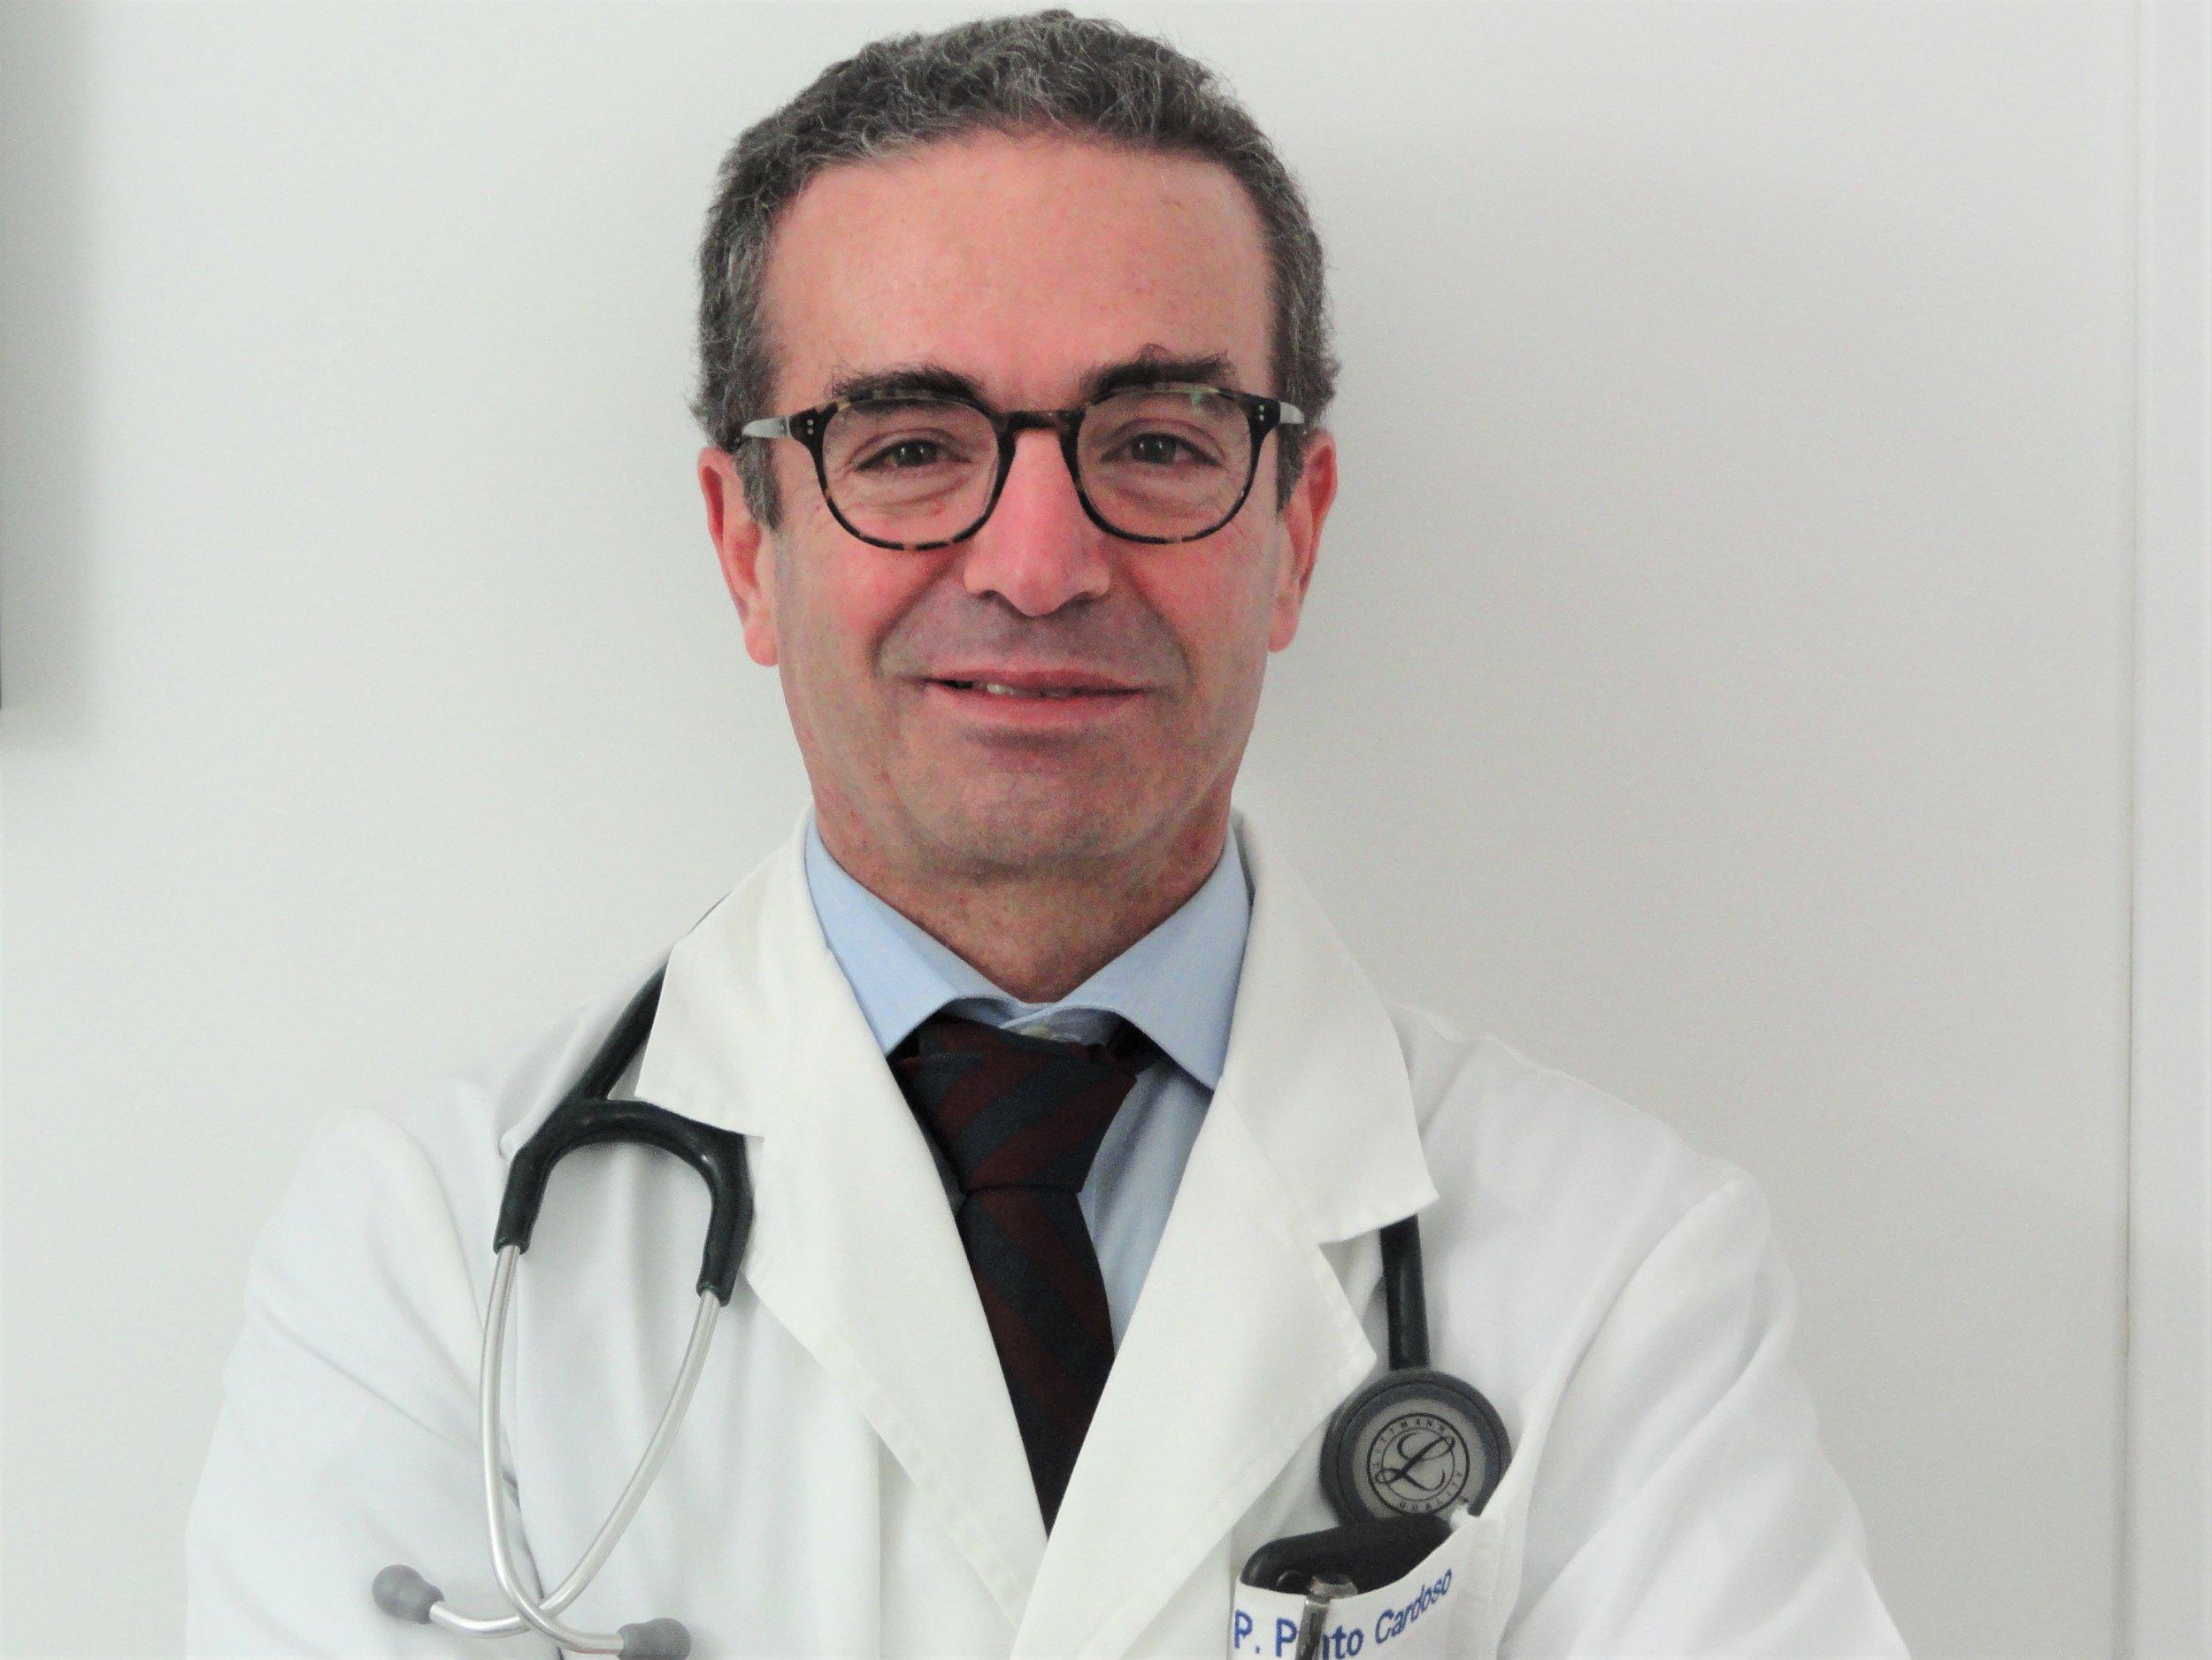 Dr. Pedro Pinto Cardoso copia - Cardiologia.jpg